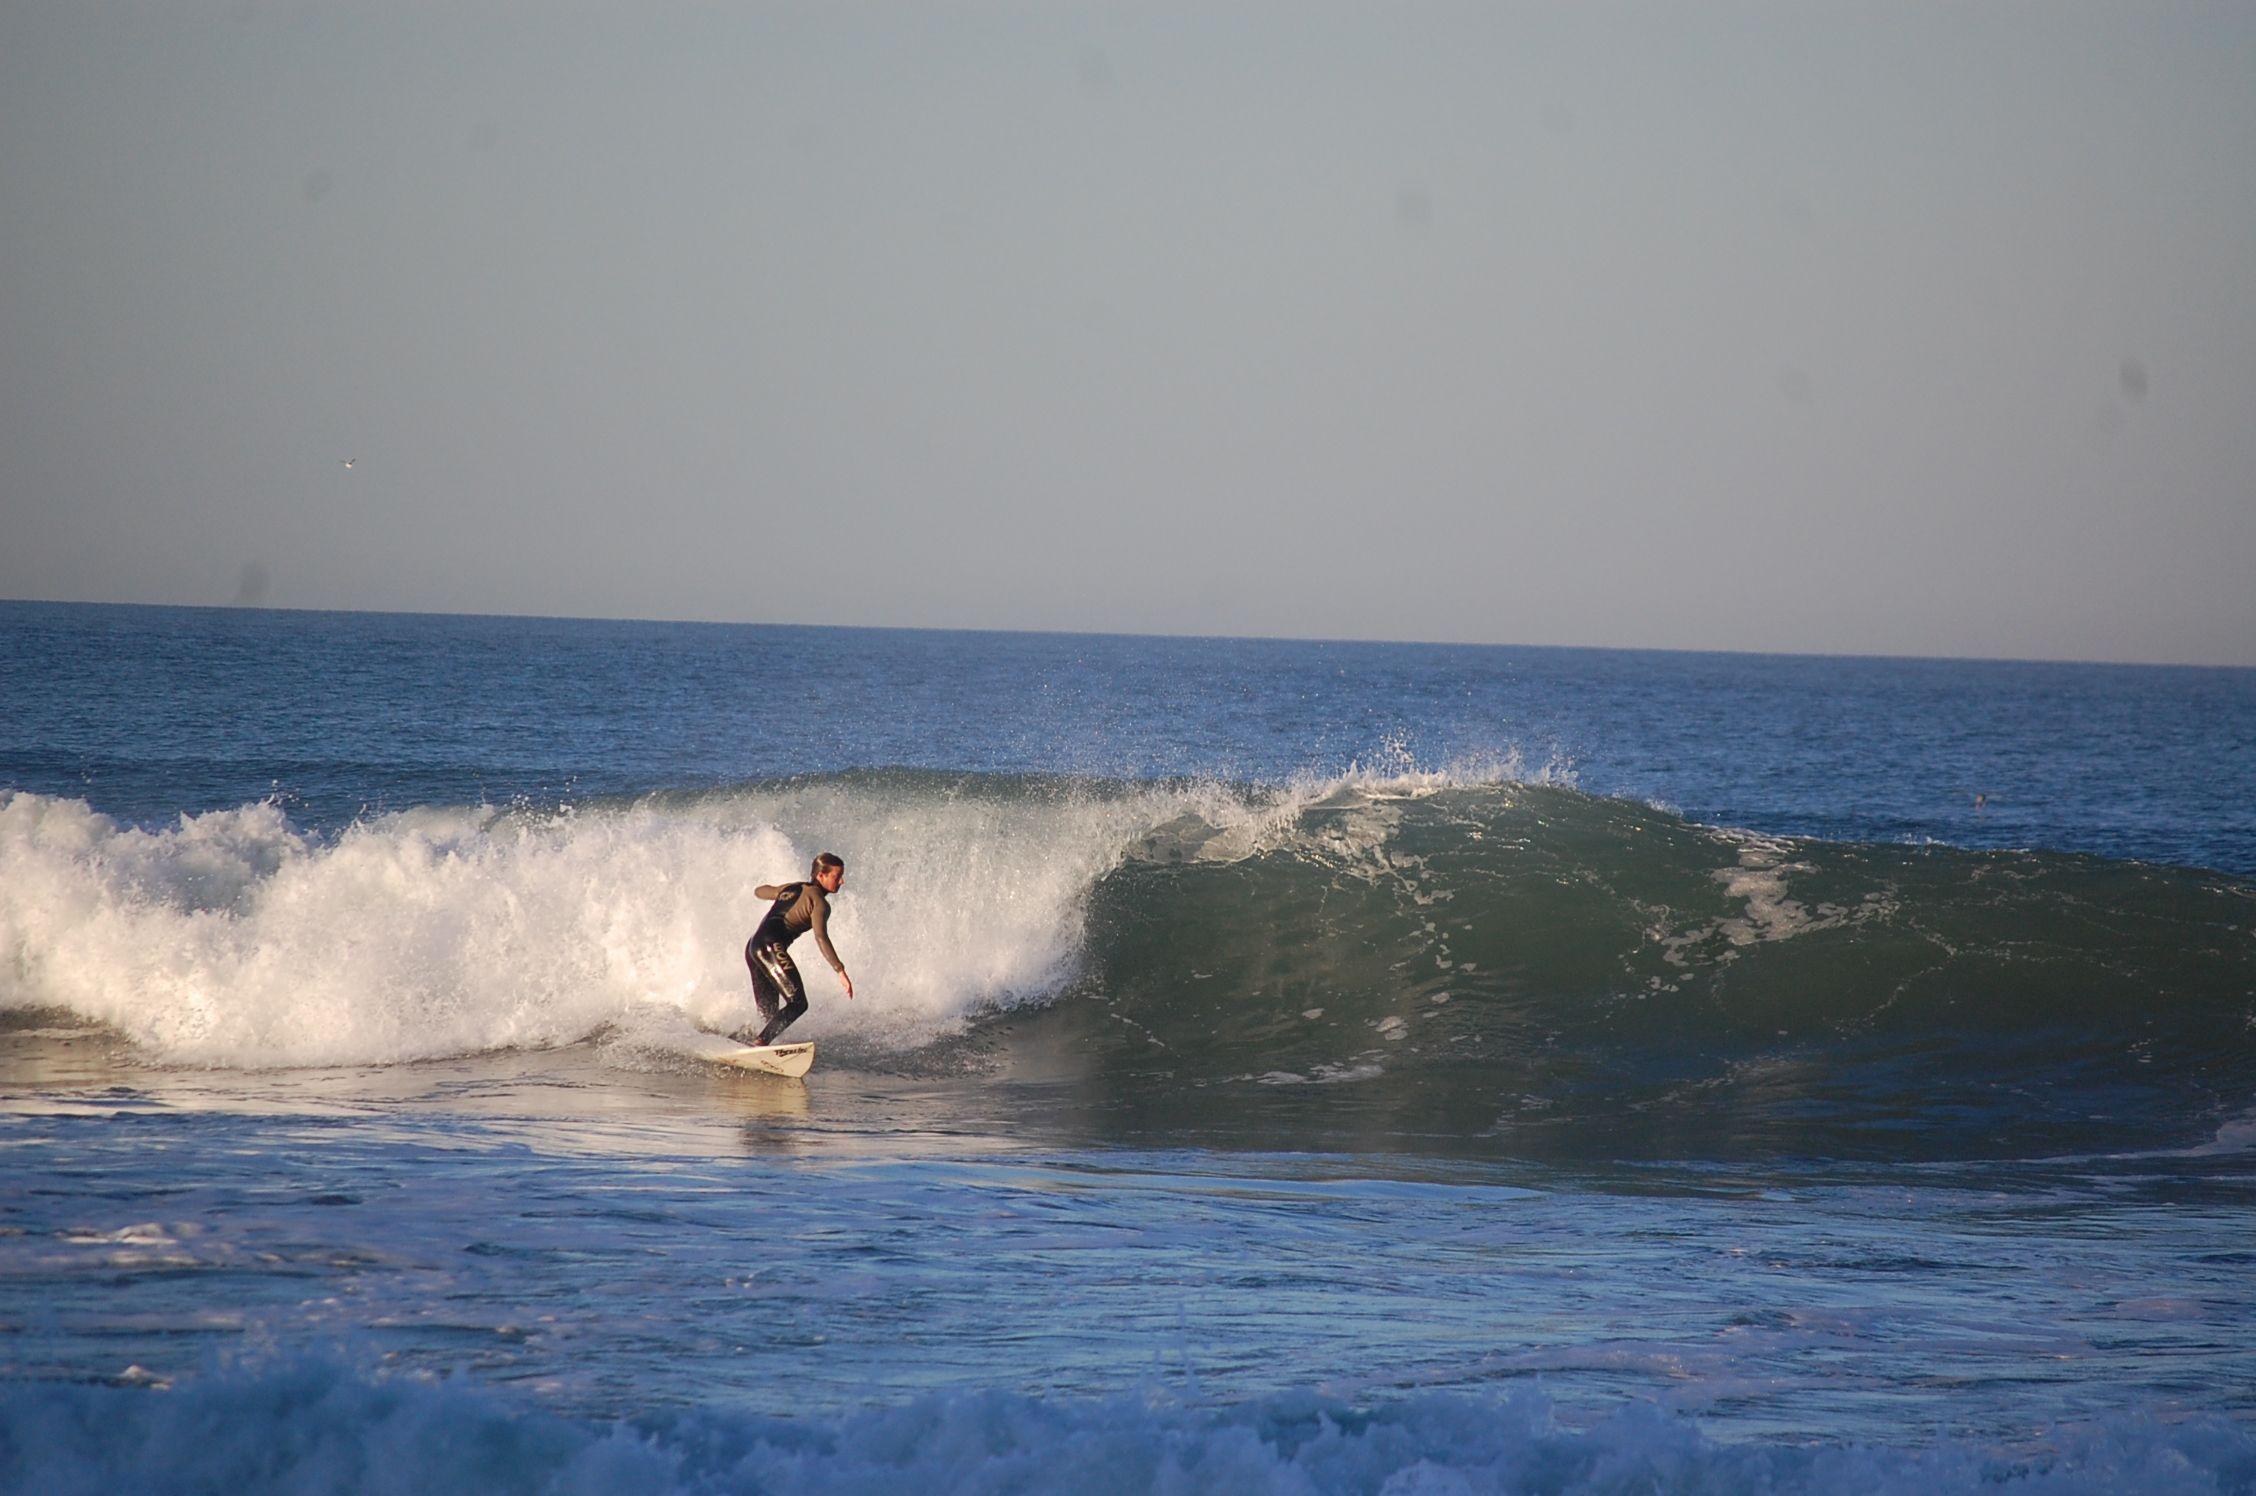 Dsc Christmas Surfing Destinations